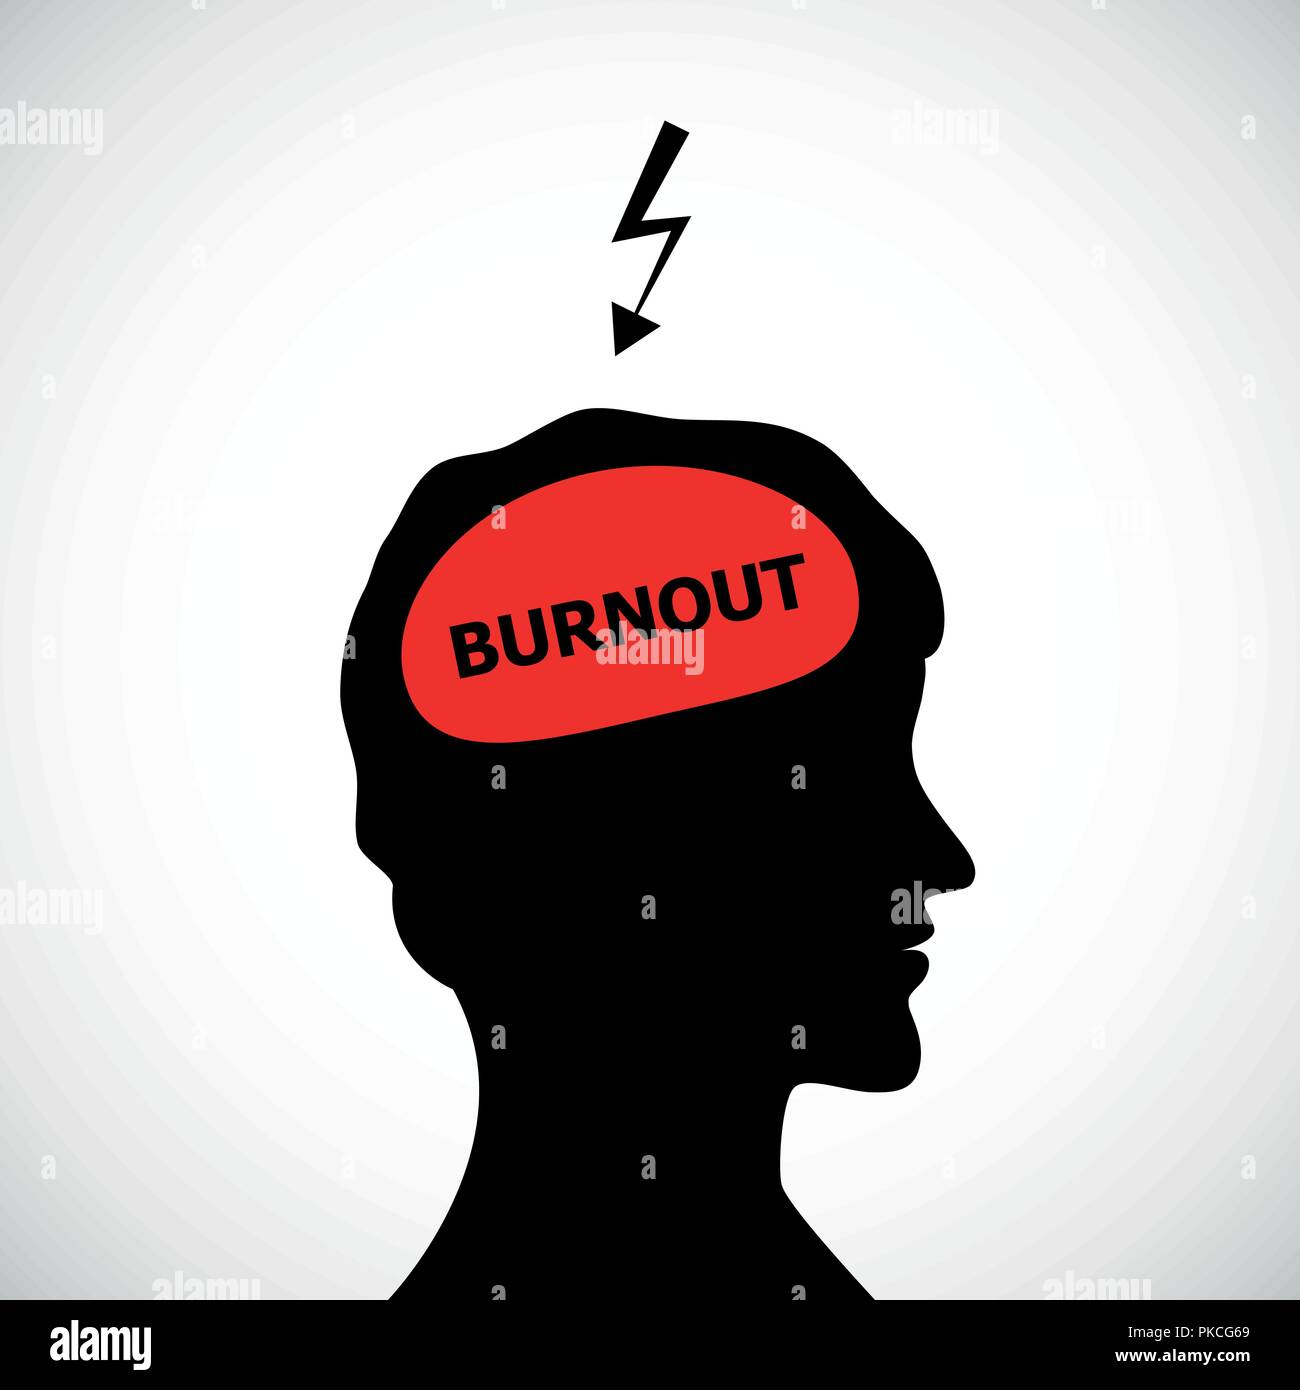 burnout in mans head silhouette concept of stress, headache, depression vector illustration - Stock Vector